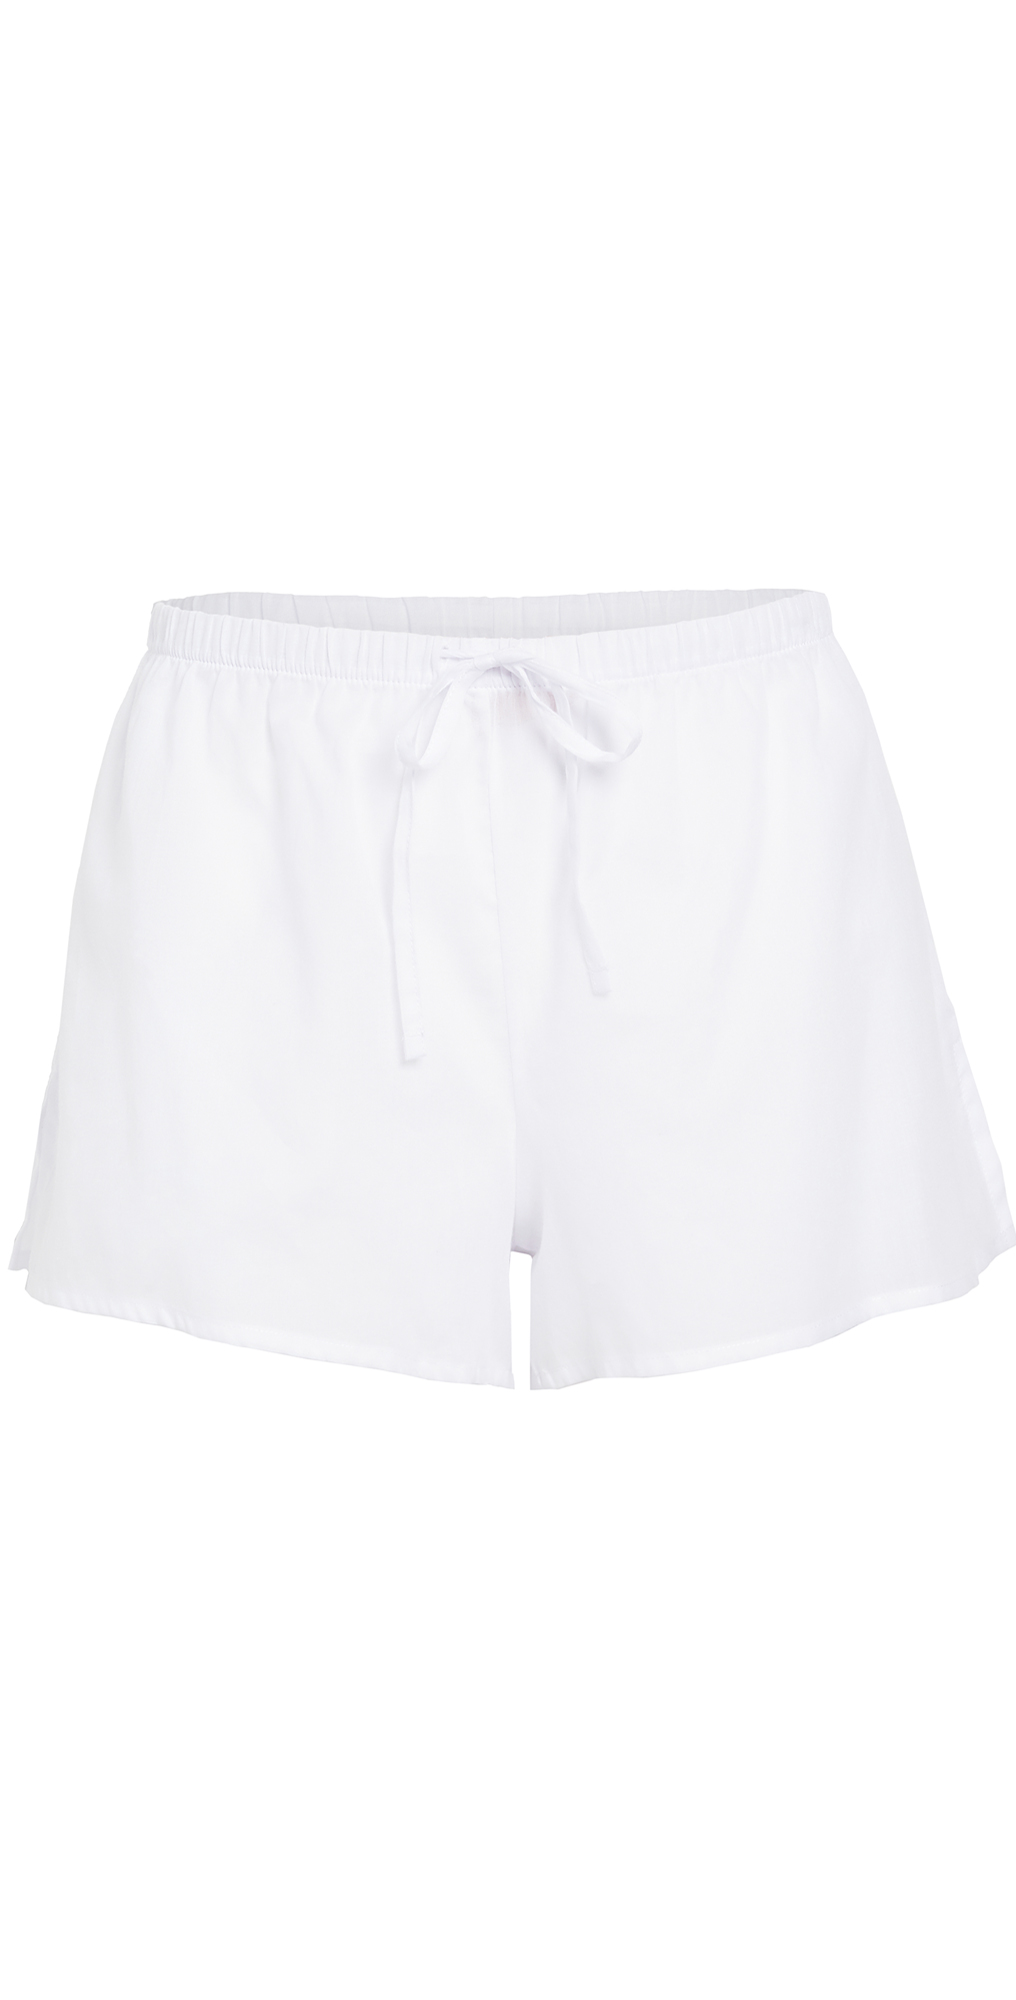 Skarlett Blue Innocent Cotton Lounge Shorts